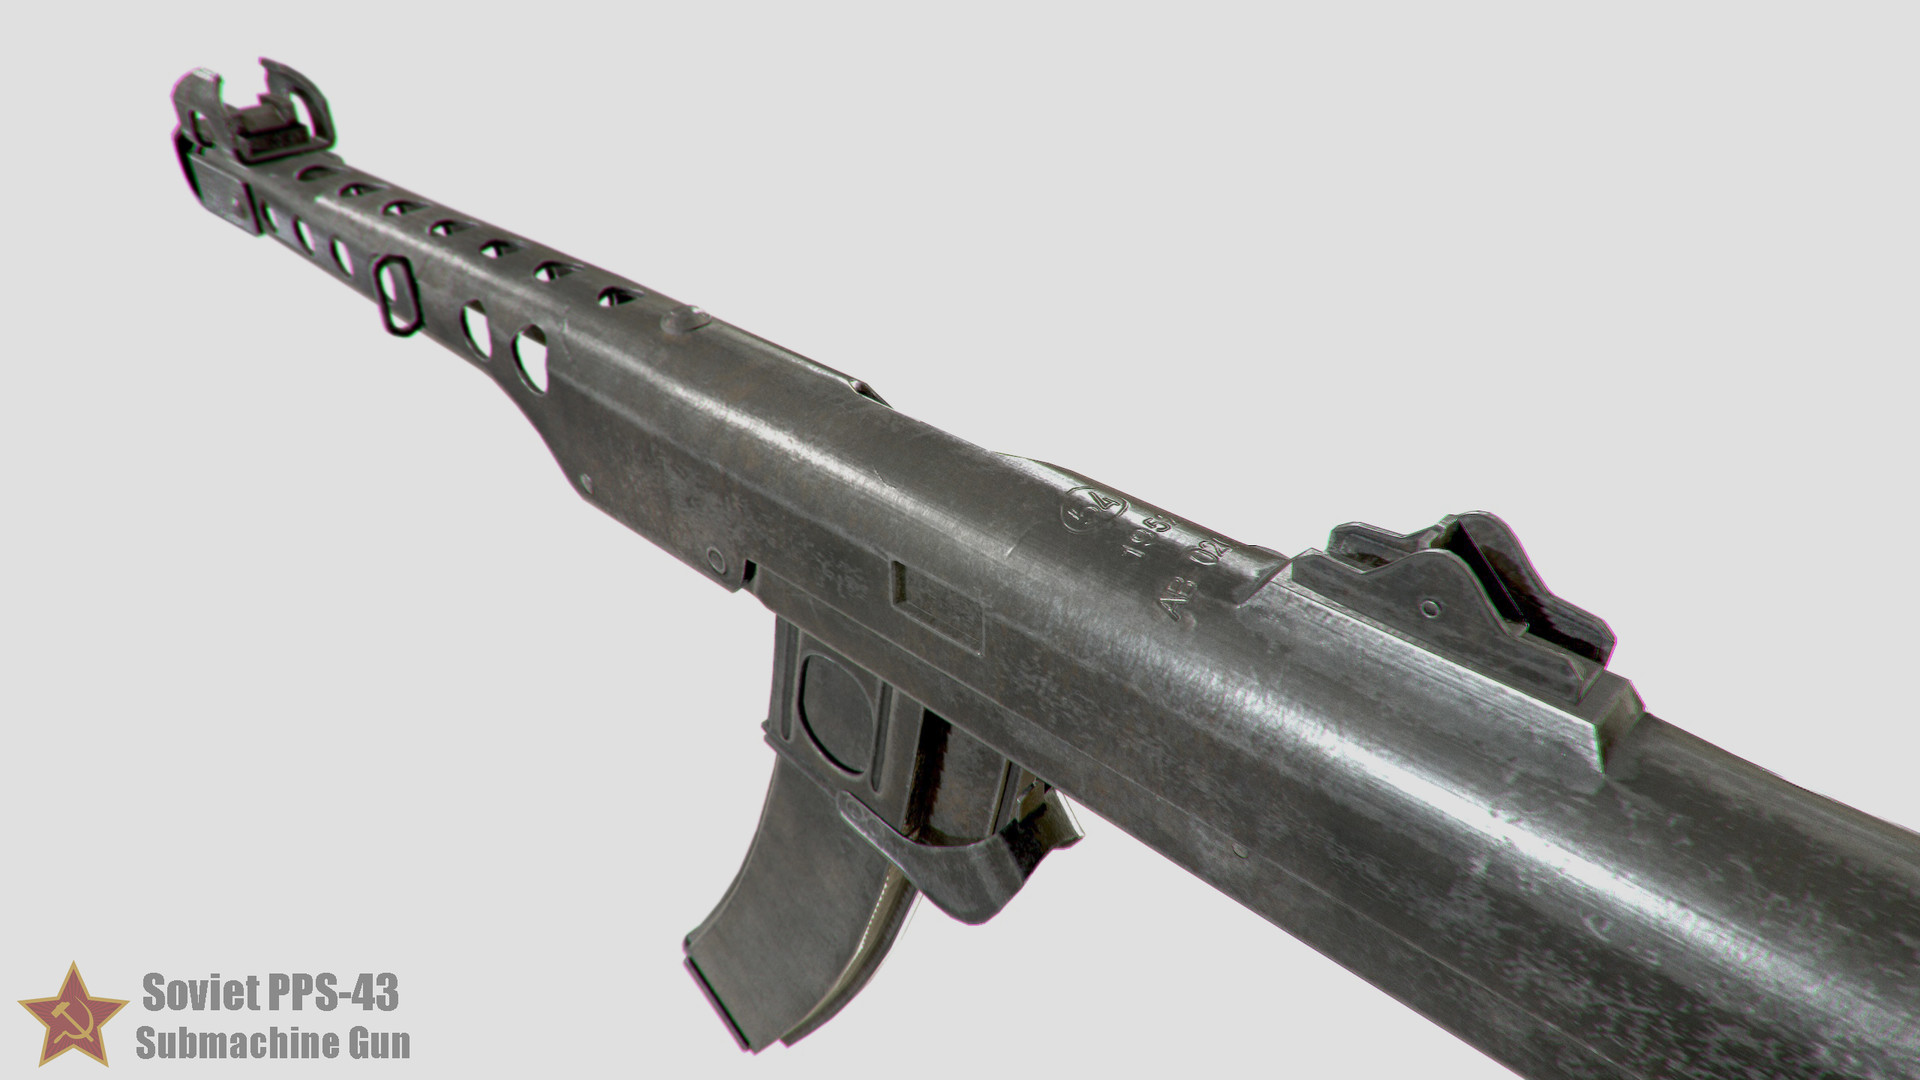 ArtStation - Soviet PPS-43 Submachine Gun, Andrey Mut